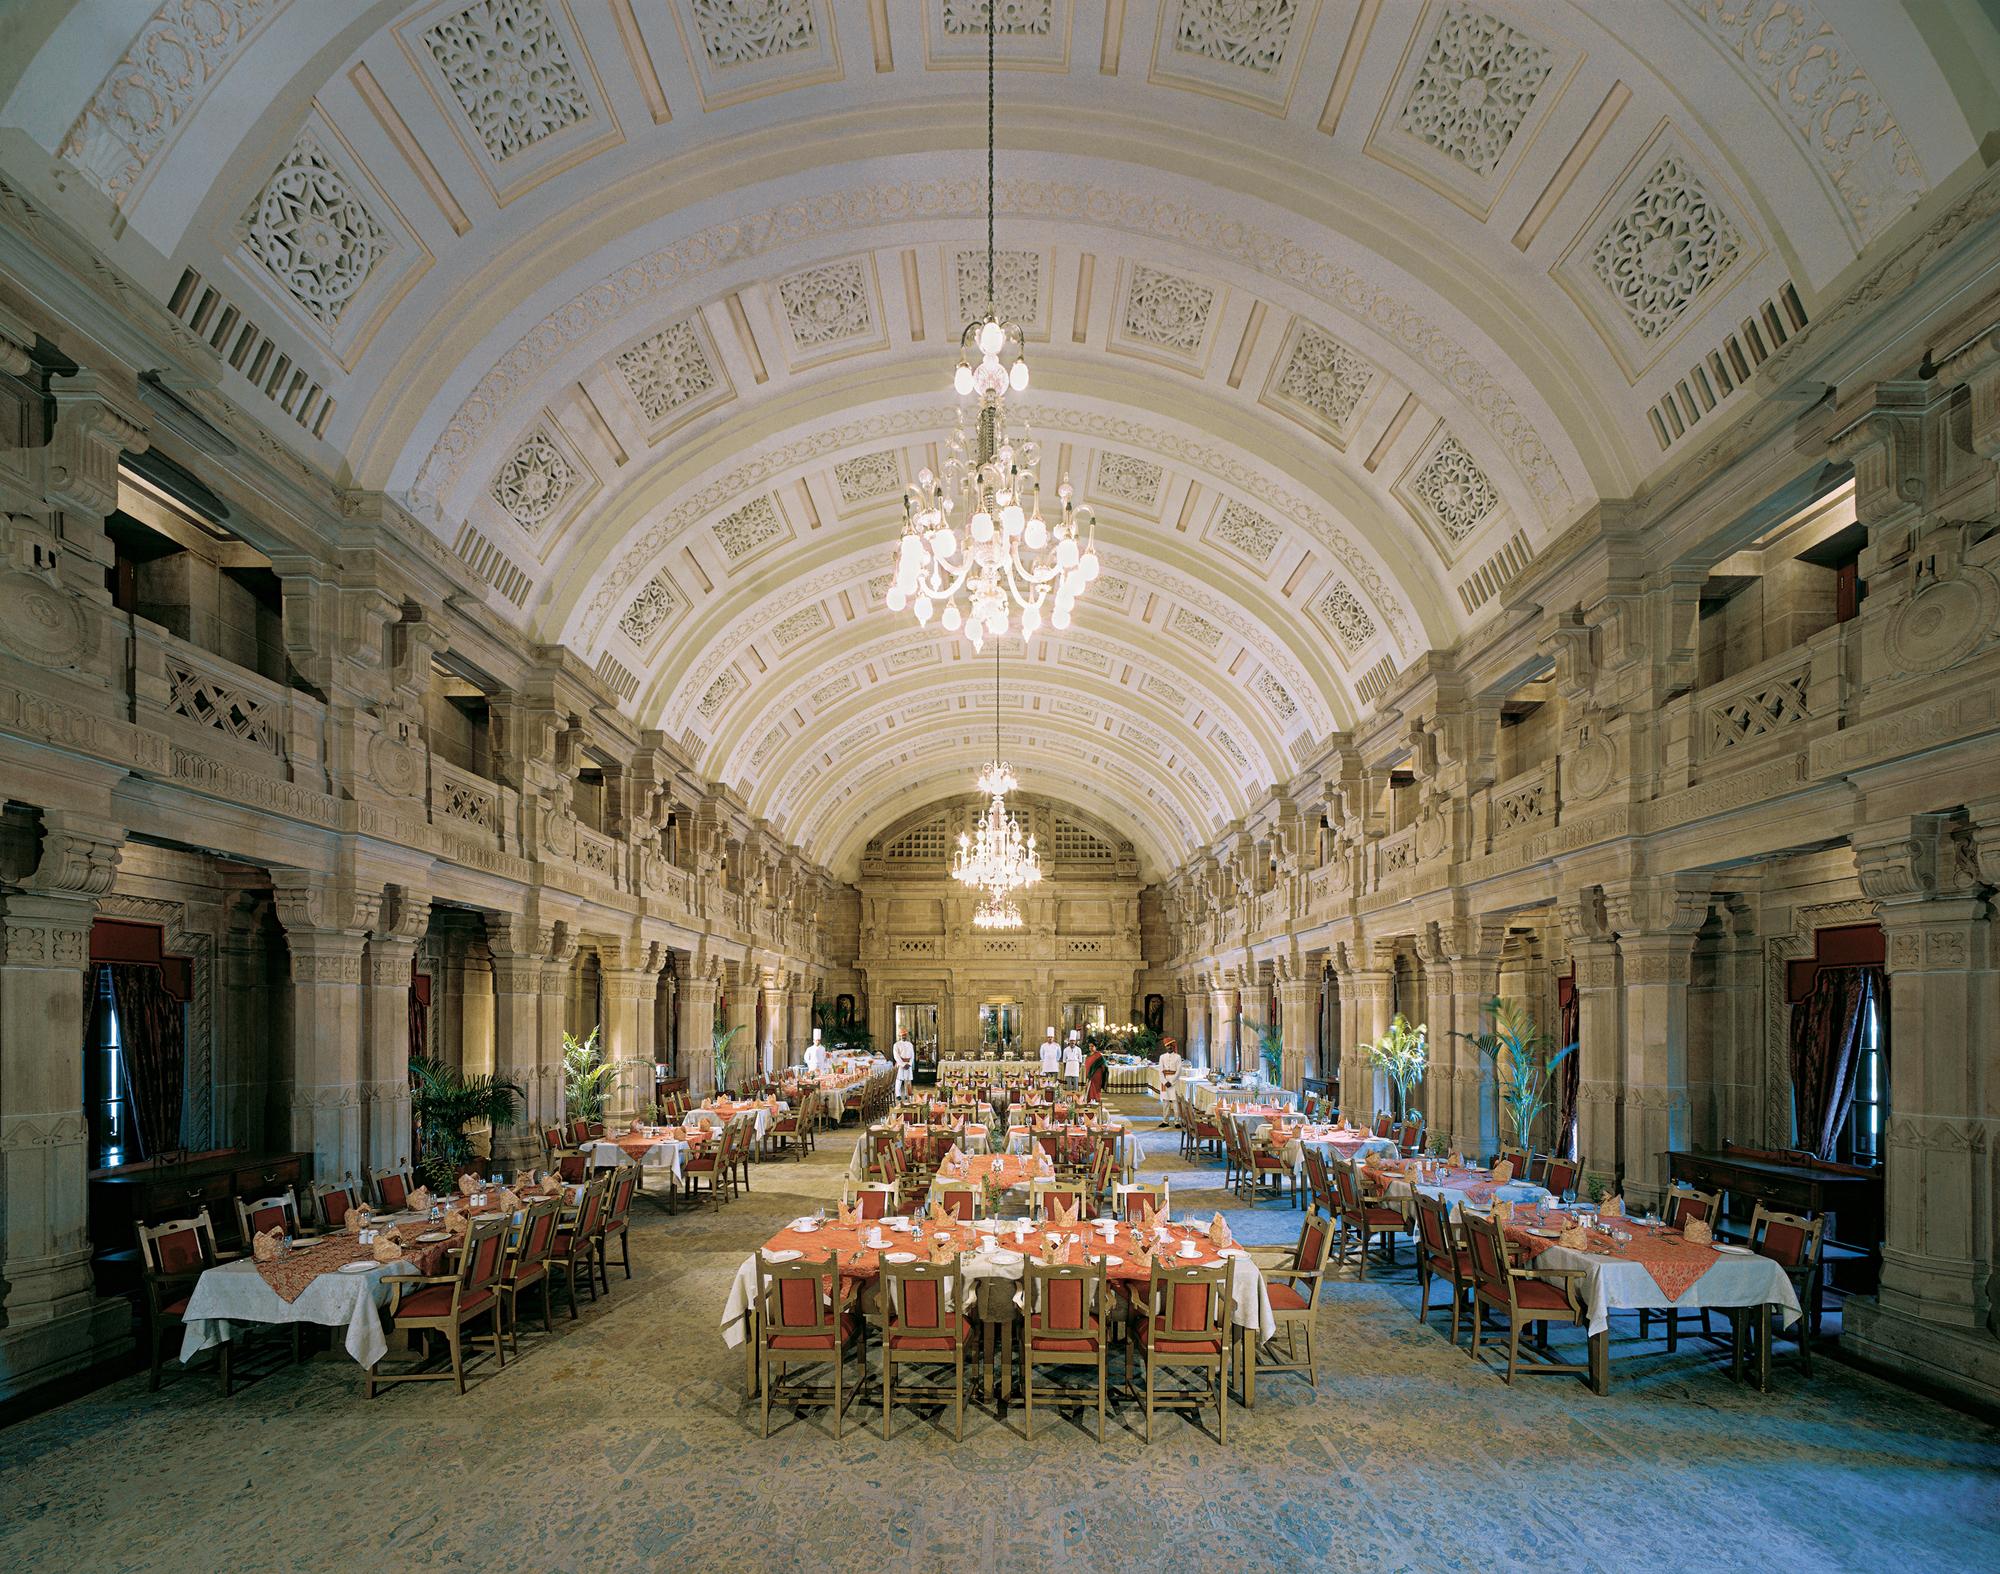 Viceroy S House A Look Inside The Umaid Bhawan Palace